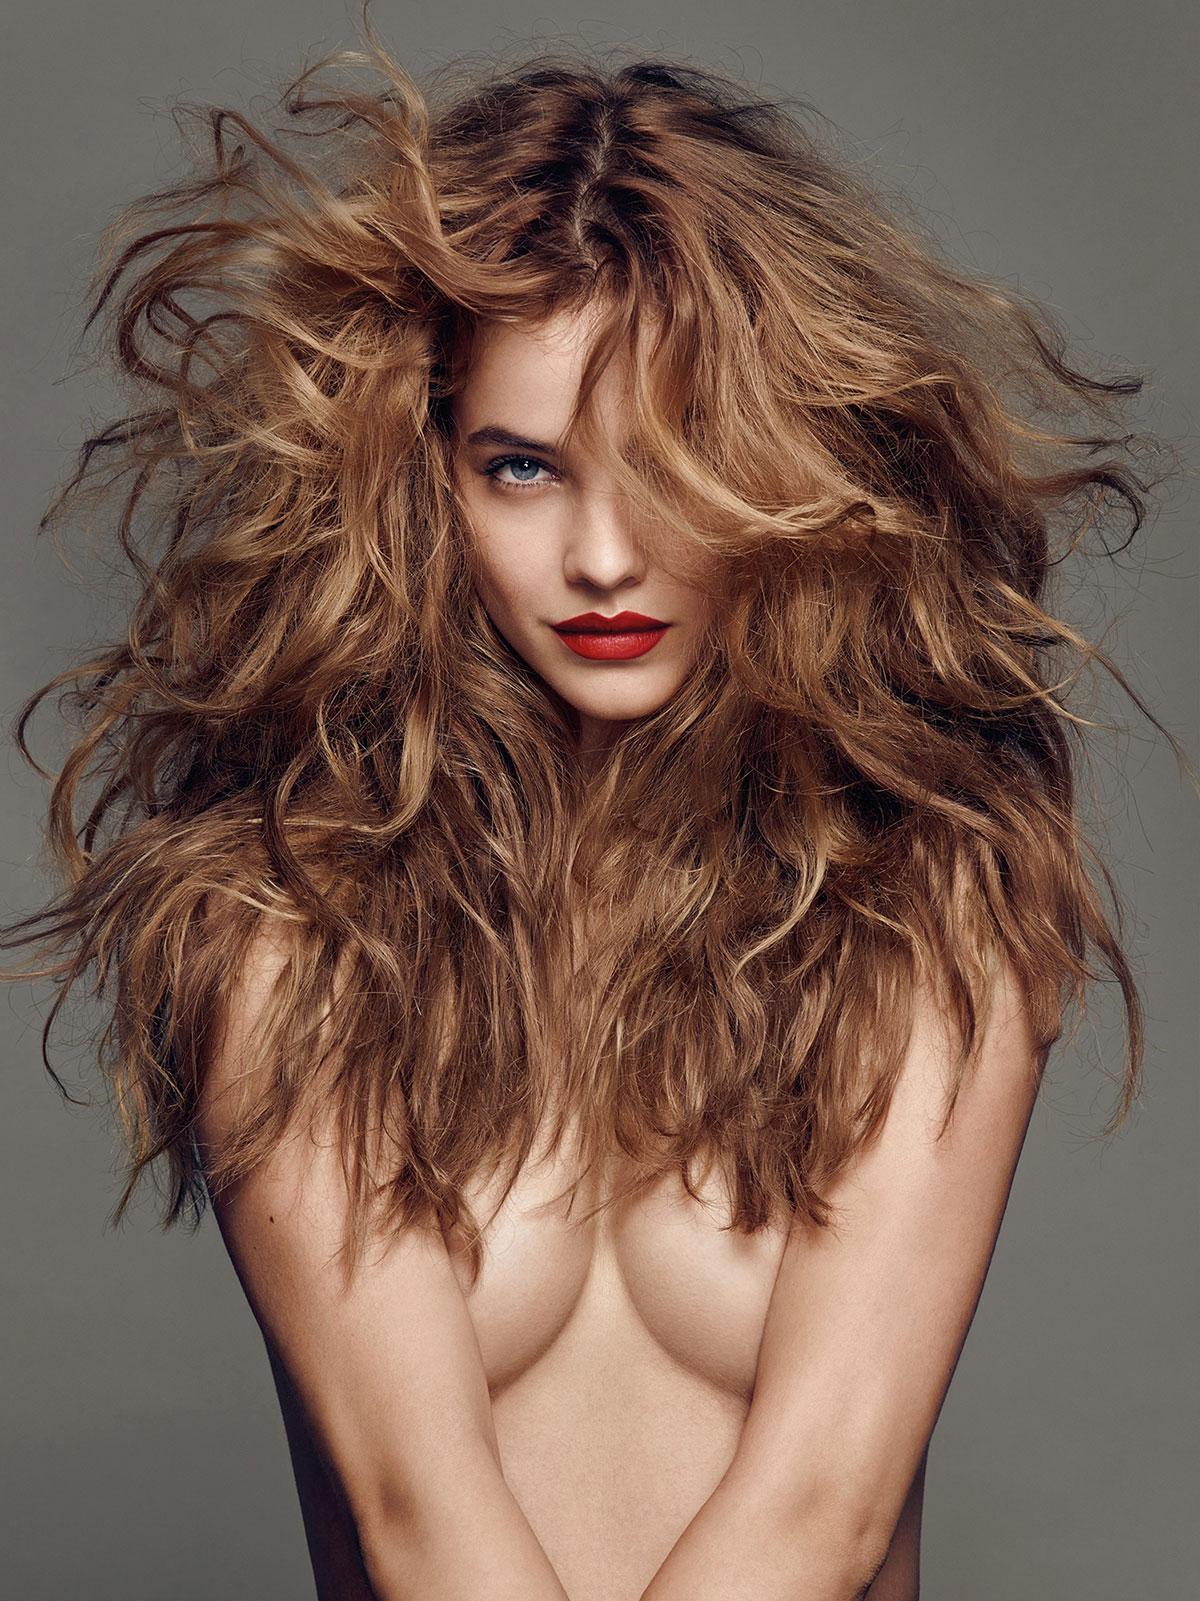 BARBARA PALVIN - Nico Bustos Photoshoot for Madame Figaro